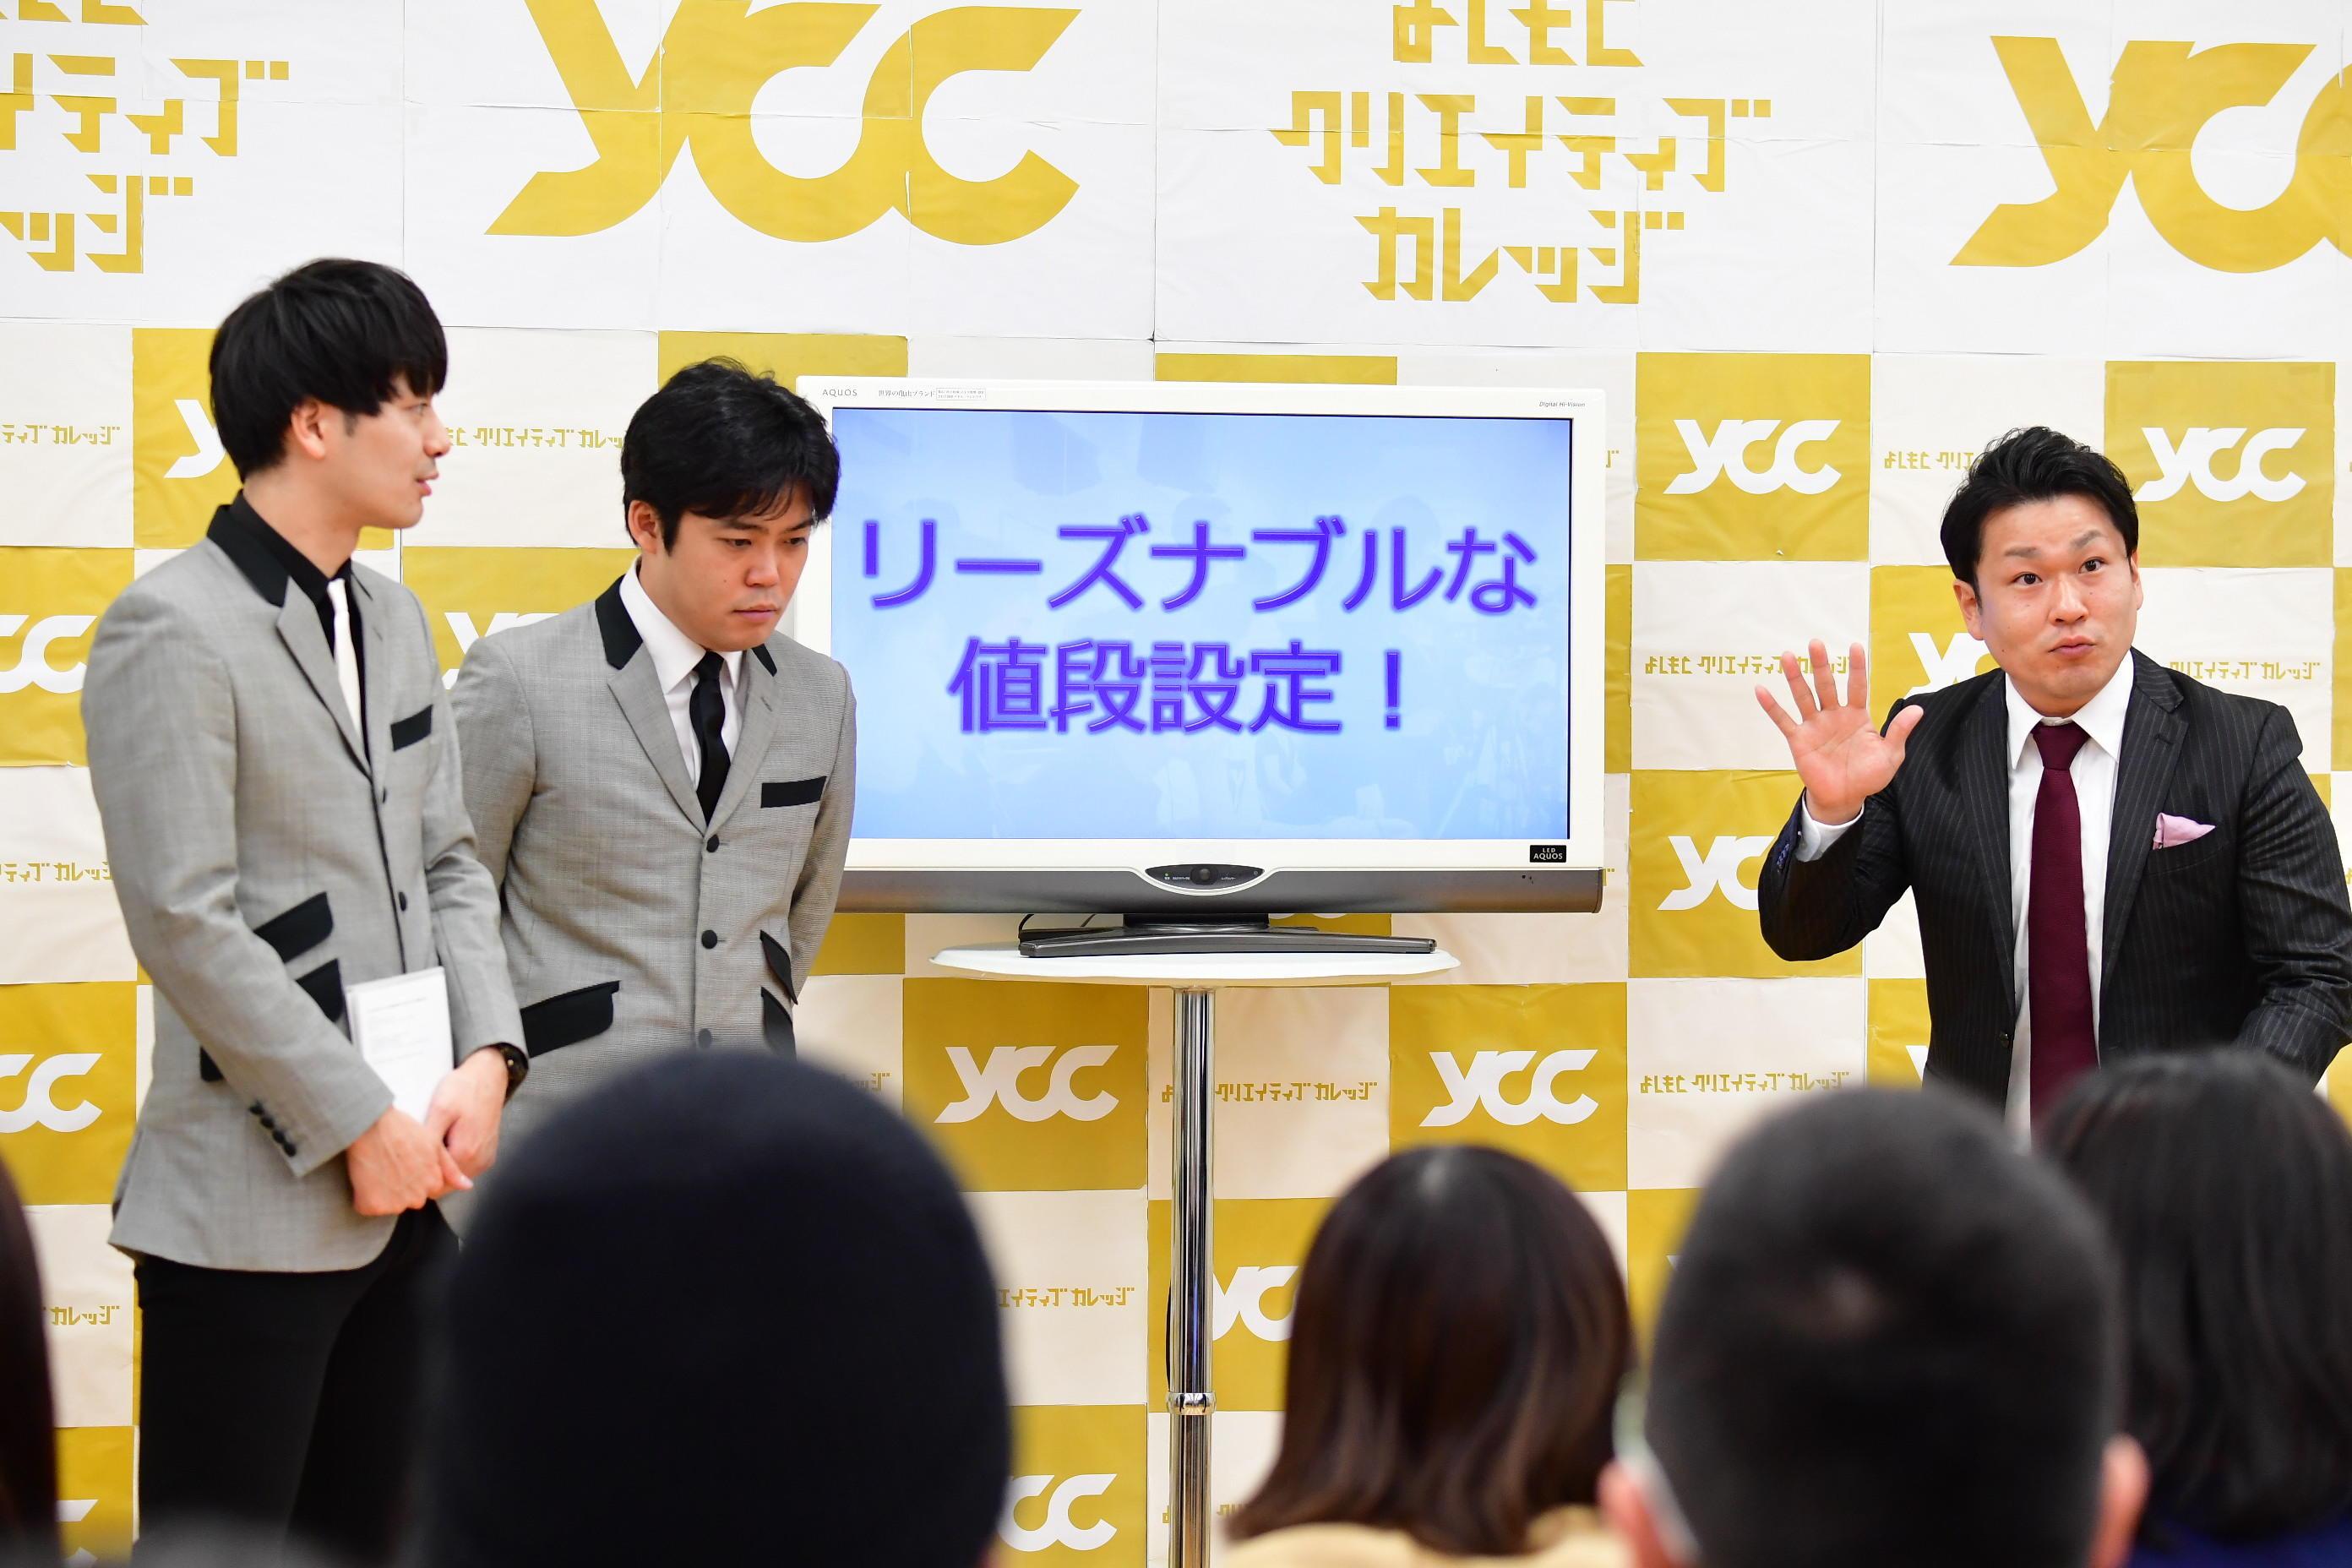 http://news.yoshimoto.co.jp/20180415153554-03ef1133c38998974ecd54ca19c322e26eb61355.jpg